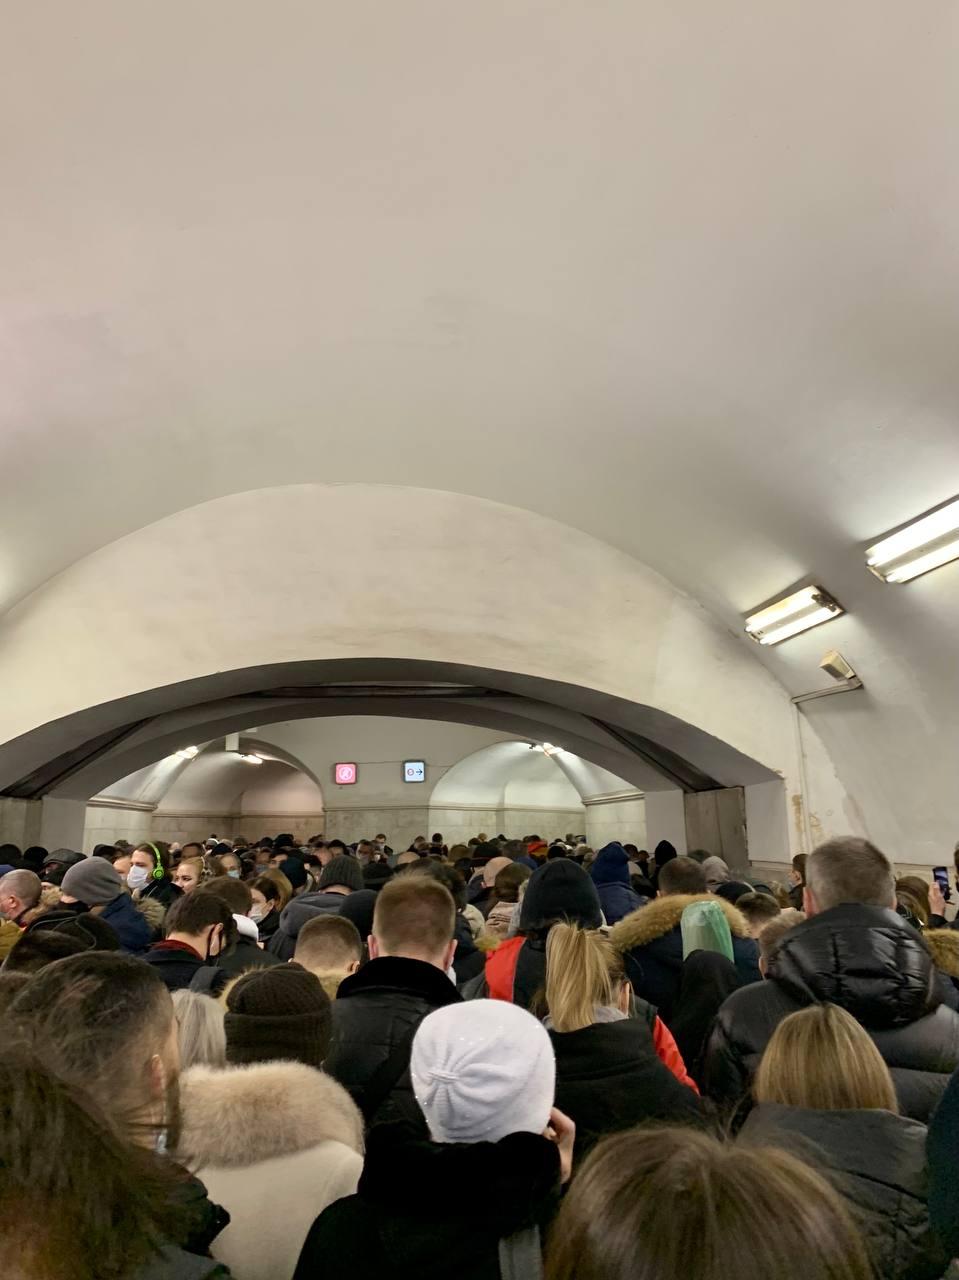 Сегодня утром метро буквально  «затопило» людьми.